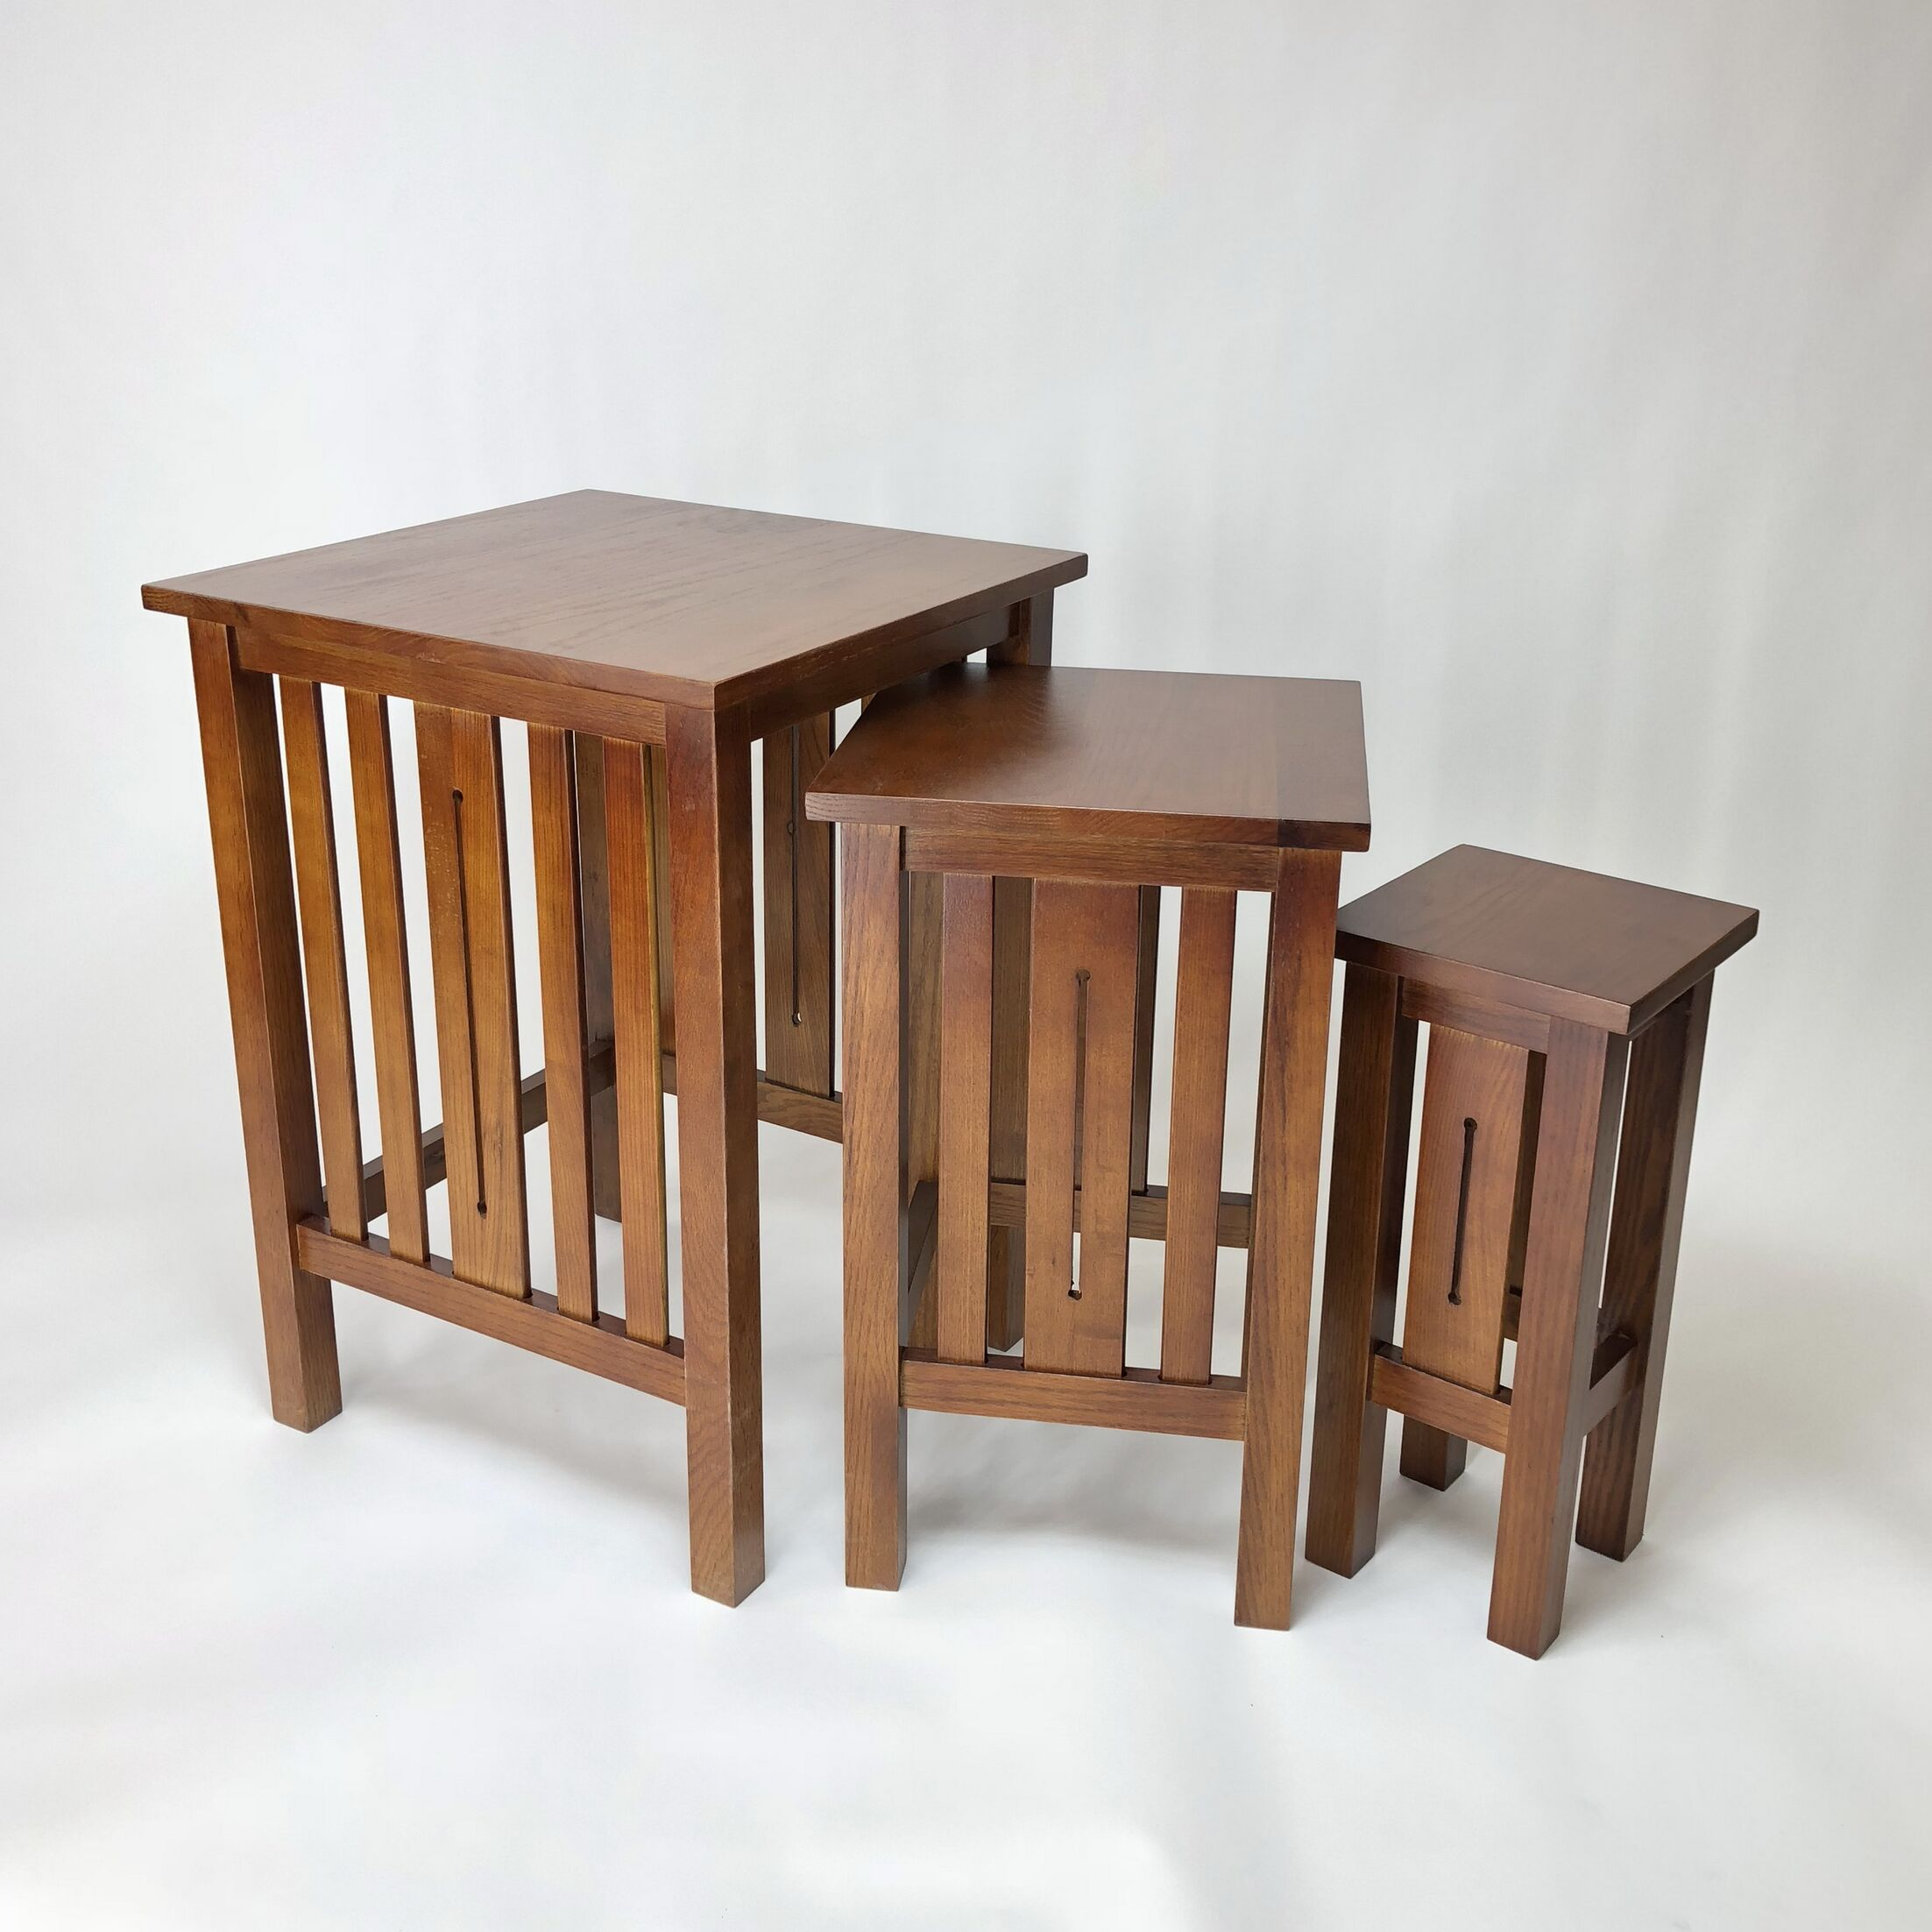 Folcroft 3 Piece Nesting Tables